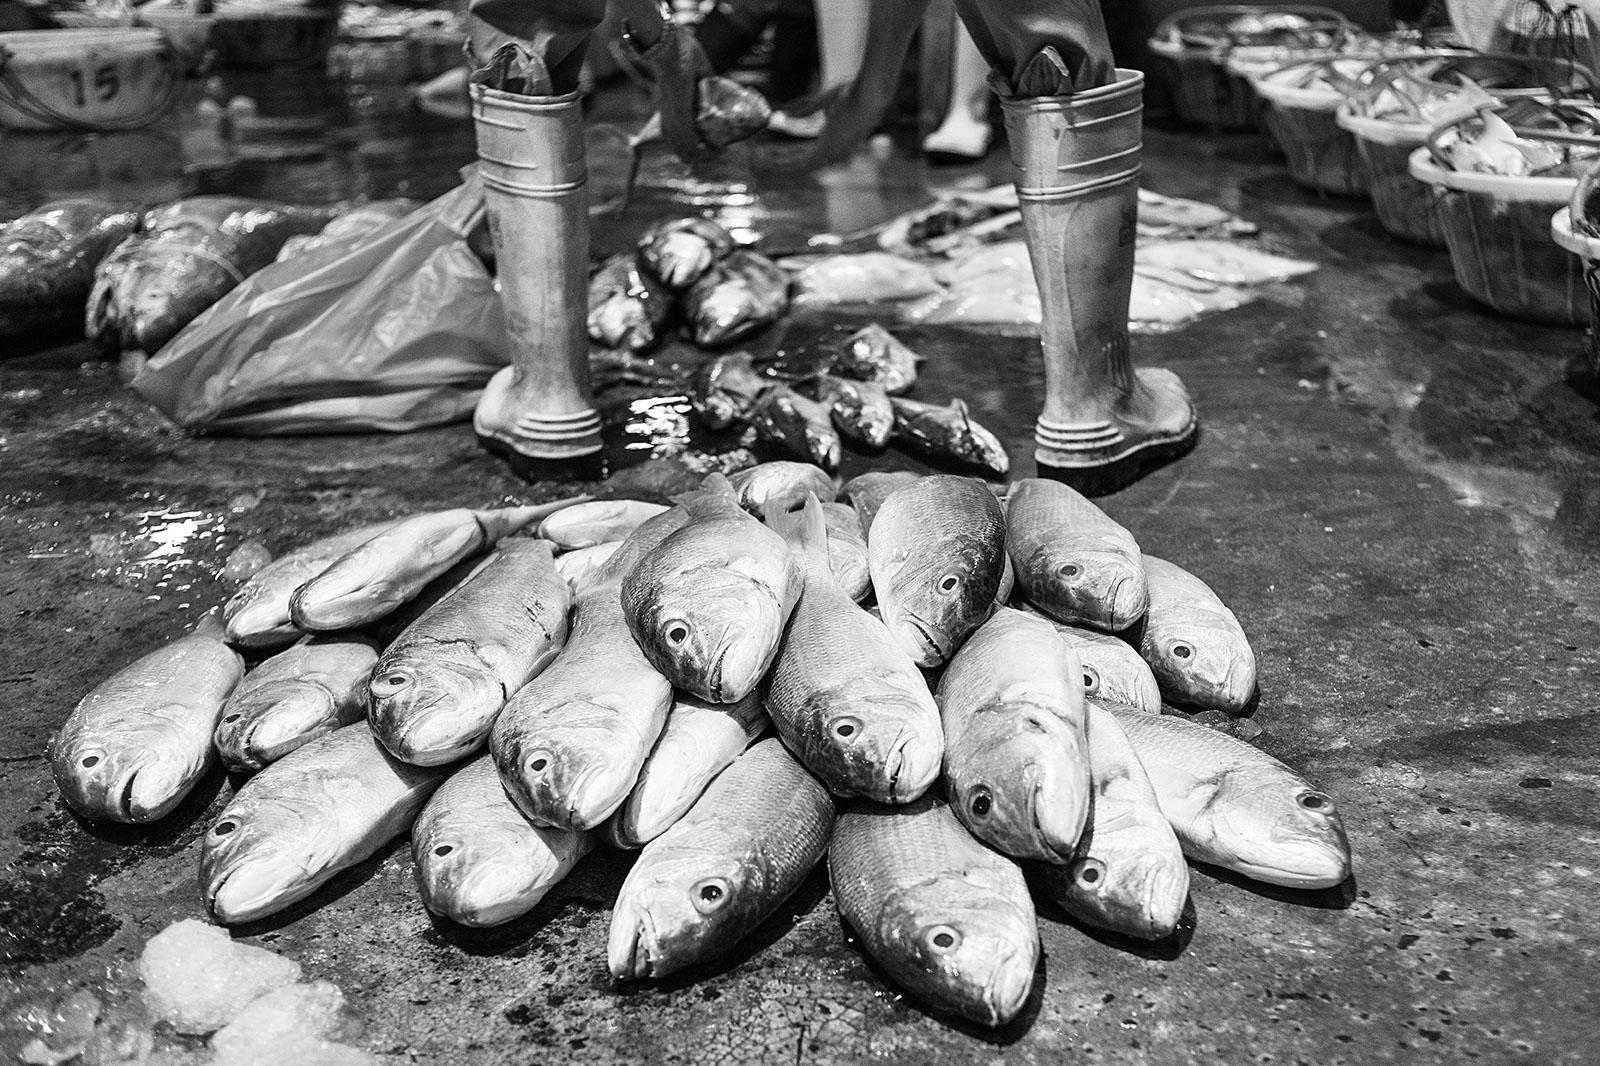 JurongFishPort Documentary_28022016_LAN3299bw.jpg